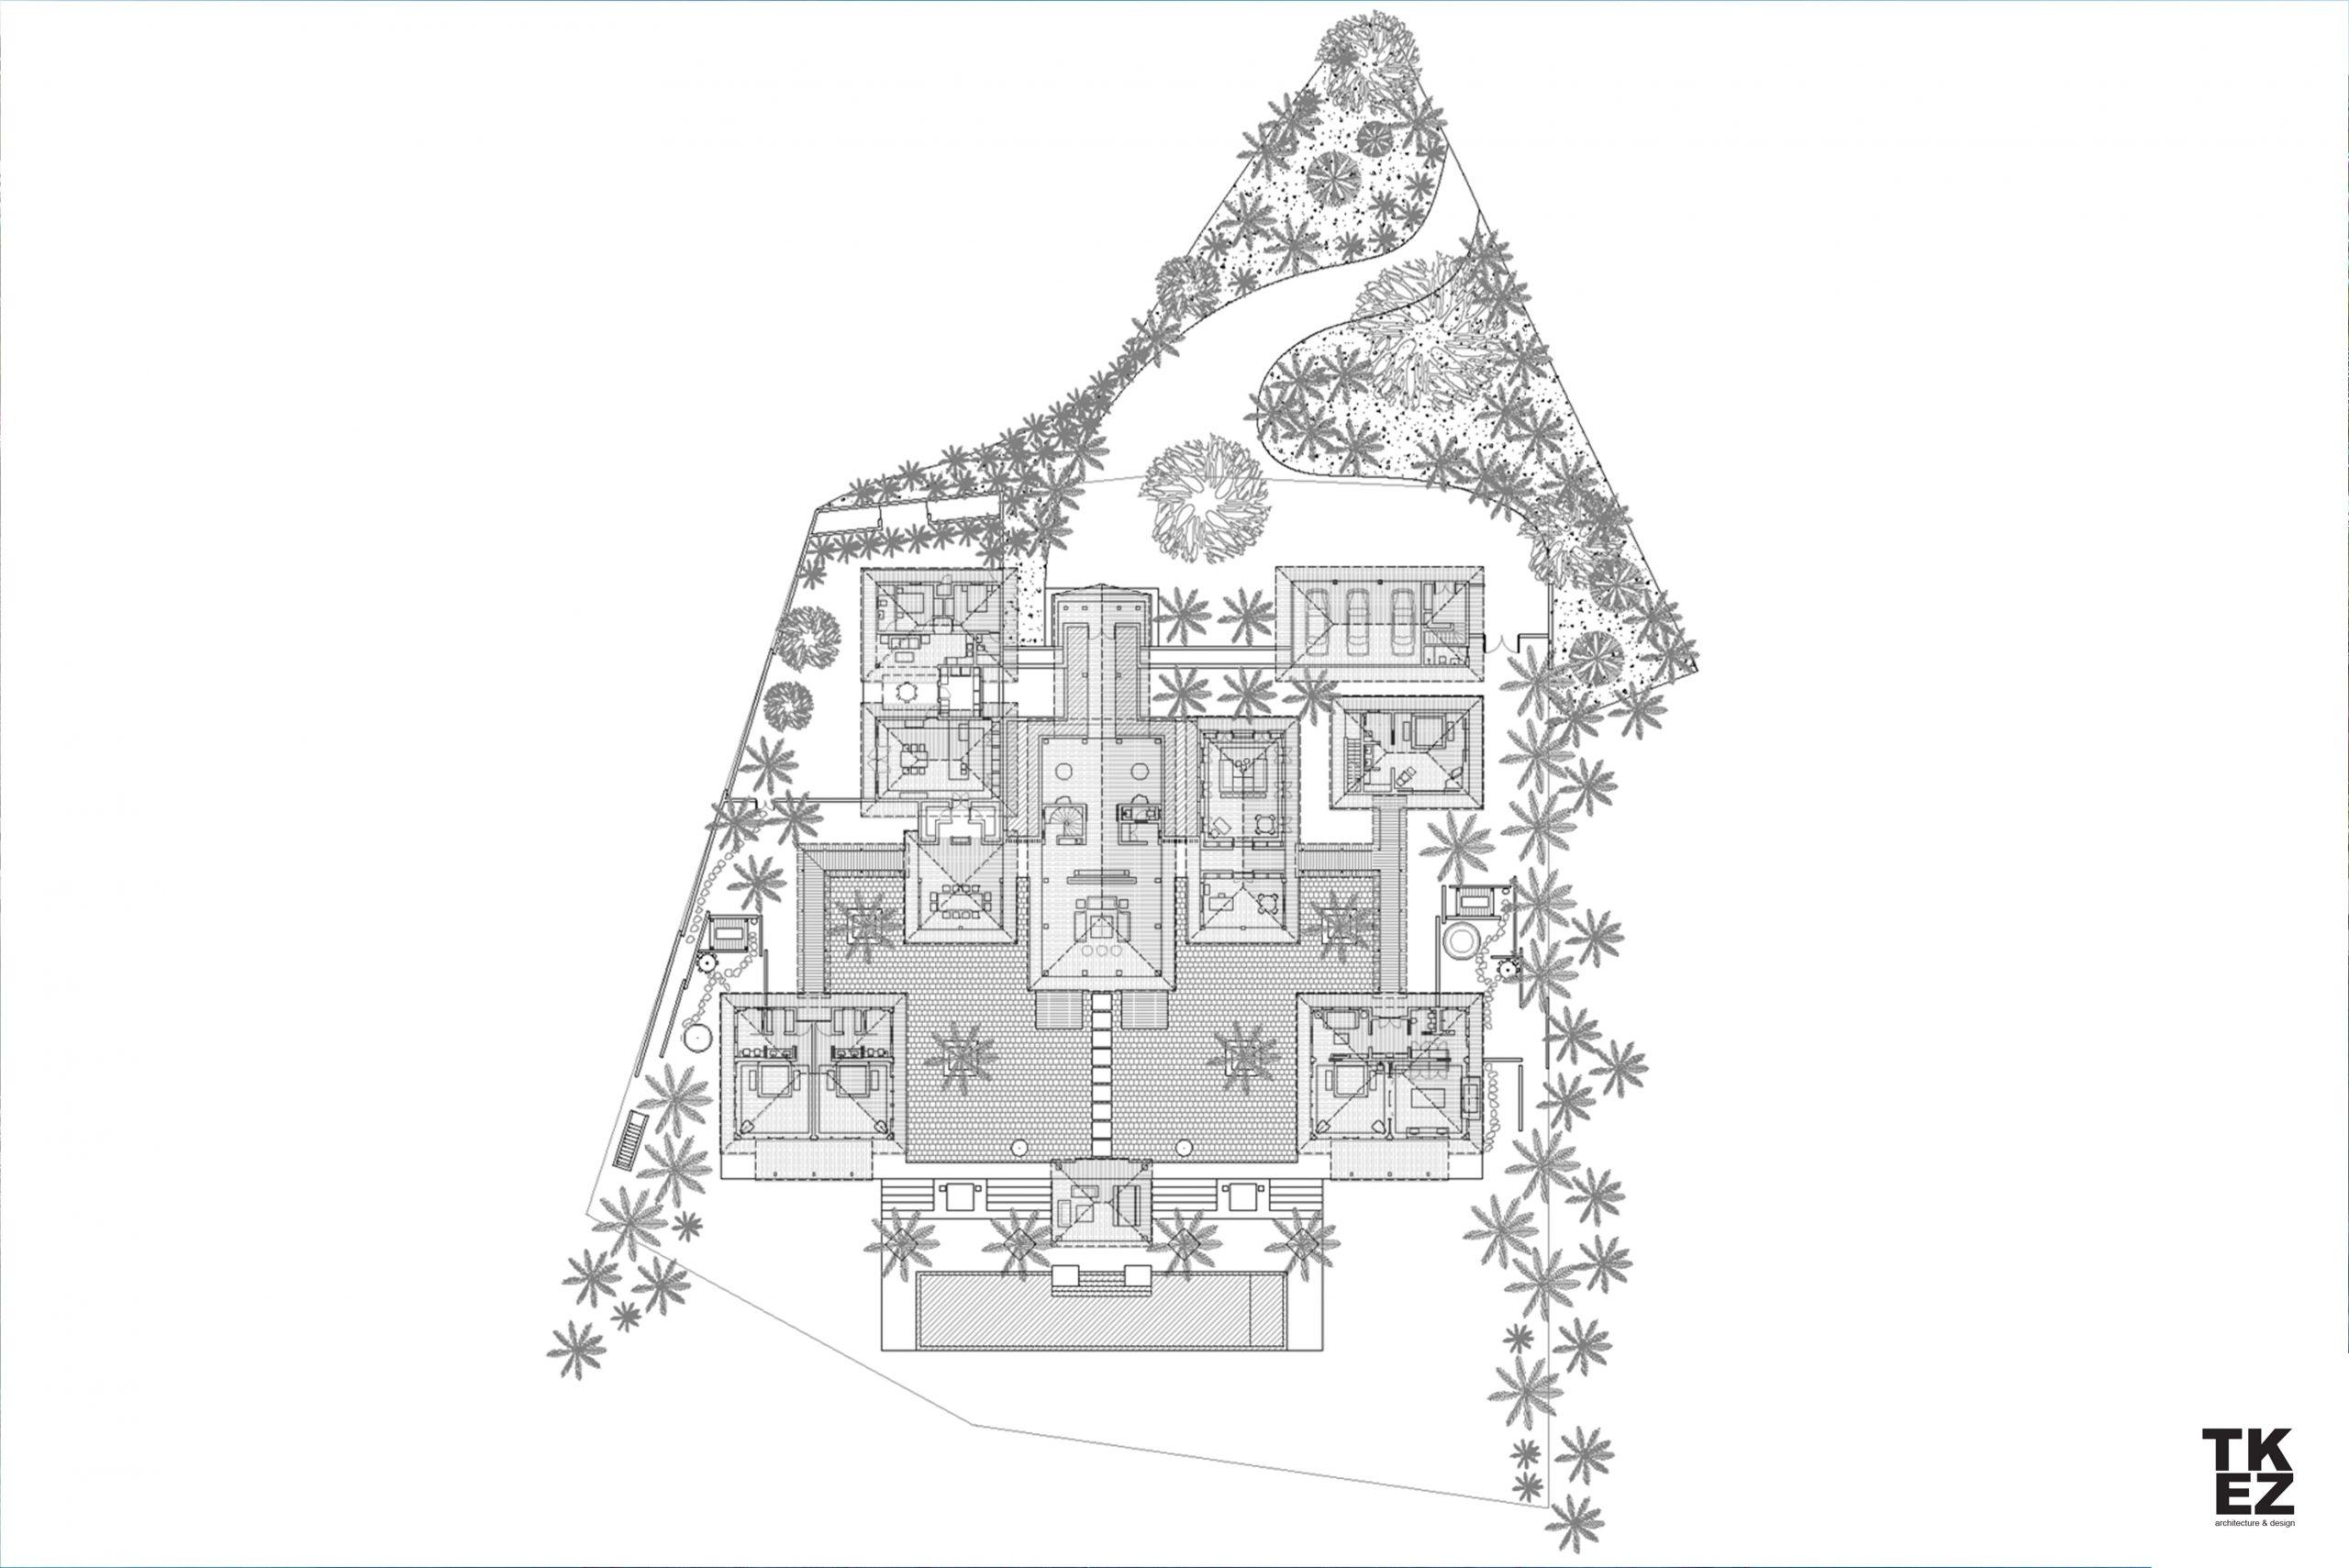 Exklusive Wohnresidenz Architekturbüro TKEZ Architekten Grundriss Caribali